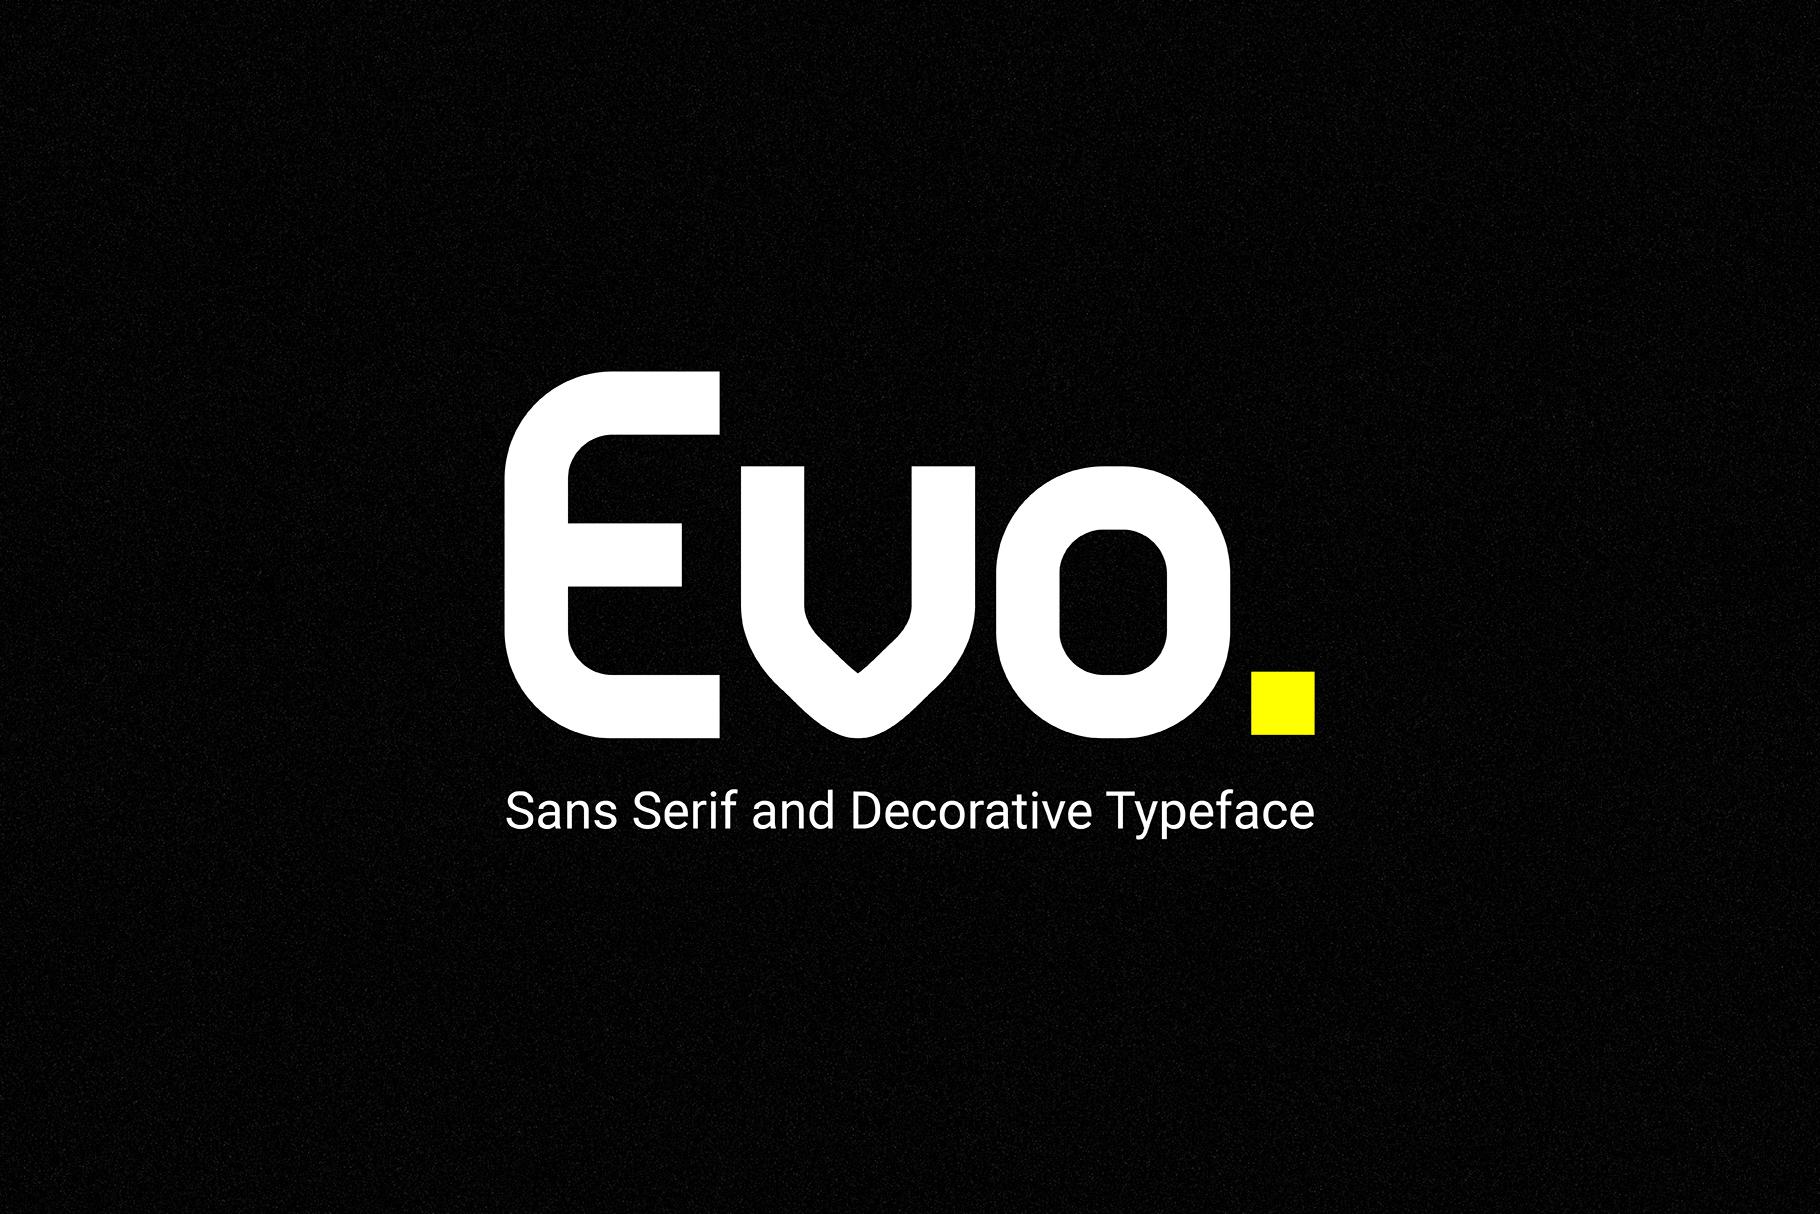 Evo - Sans&Decorative Typeface example image 1